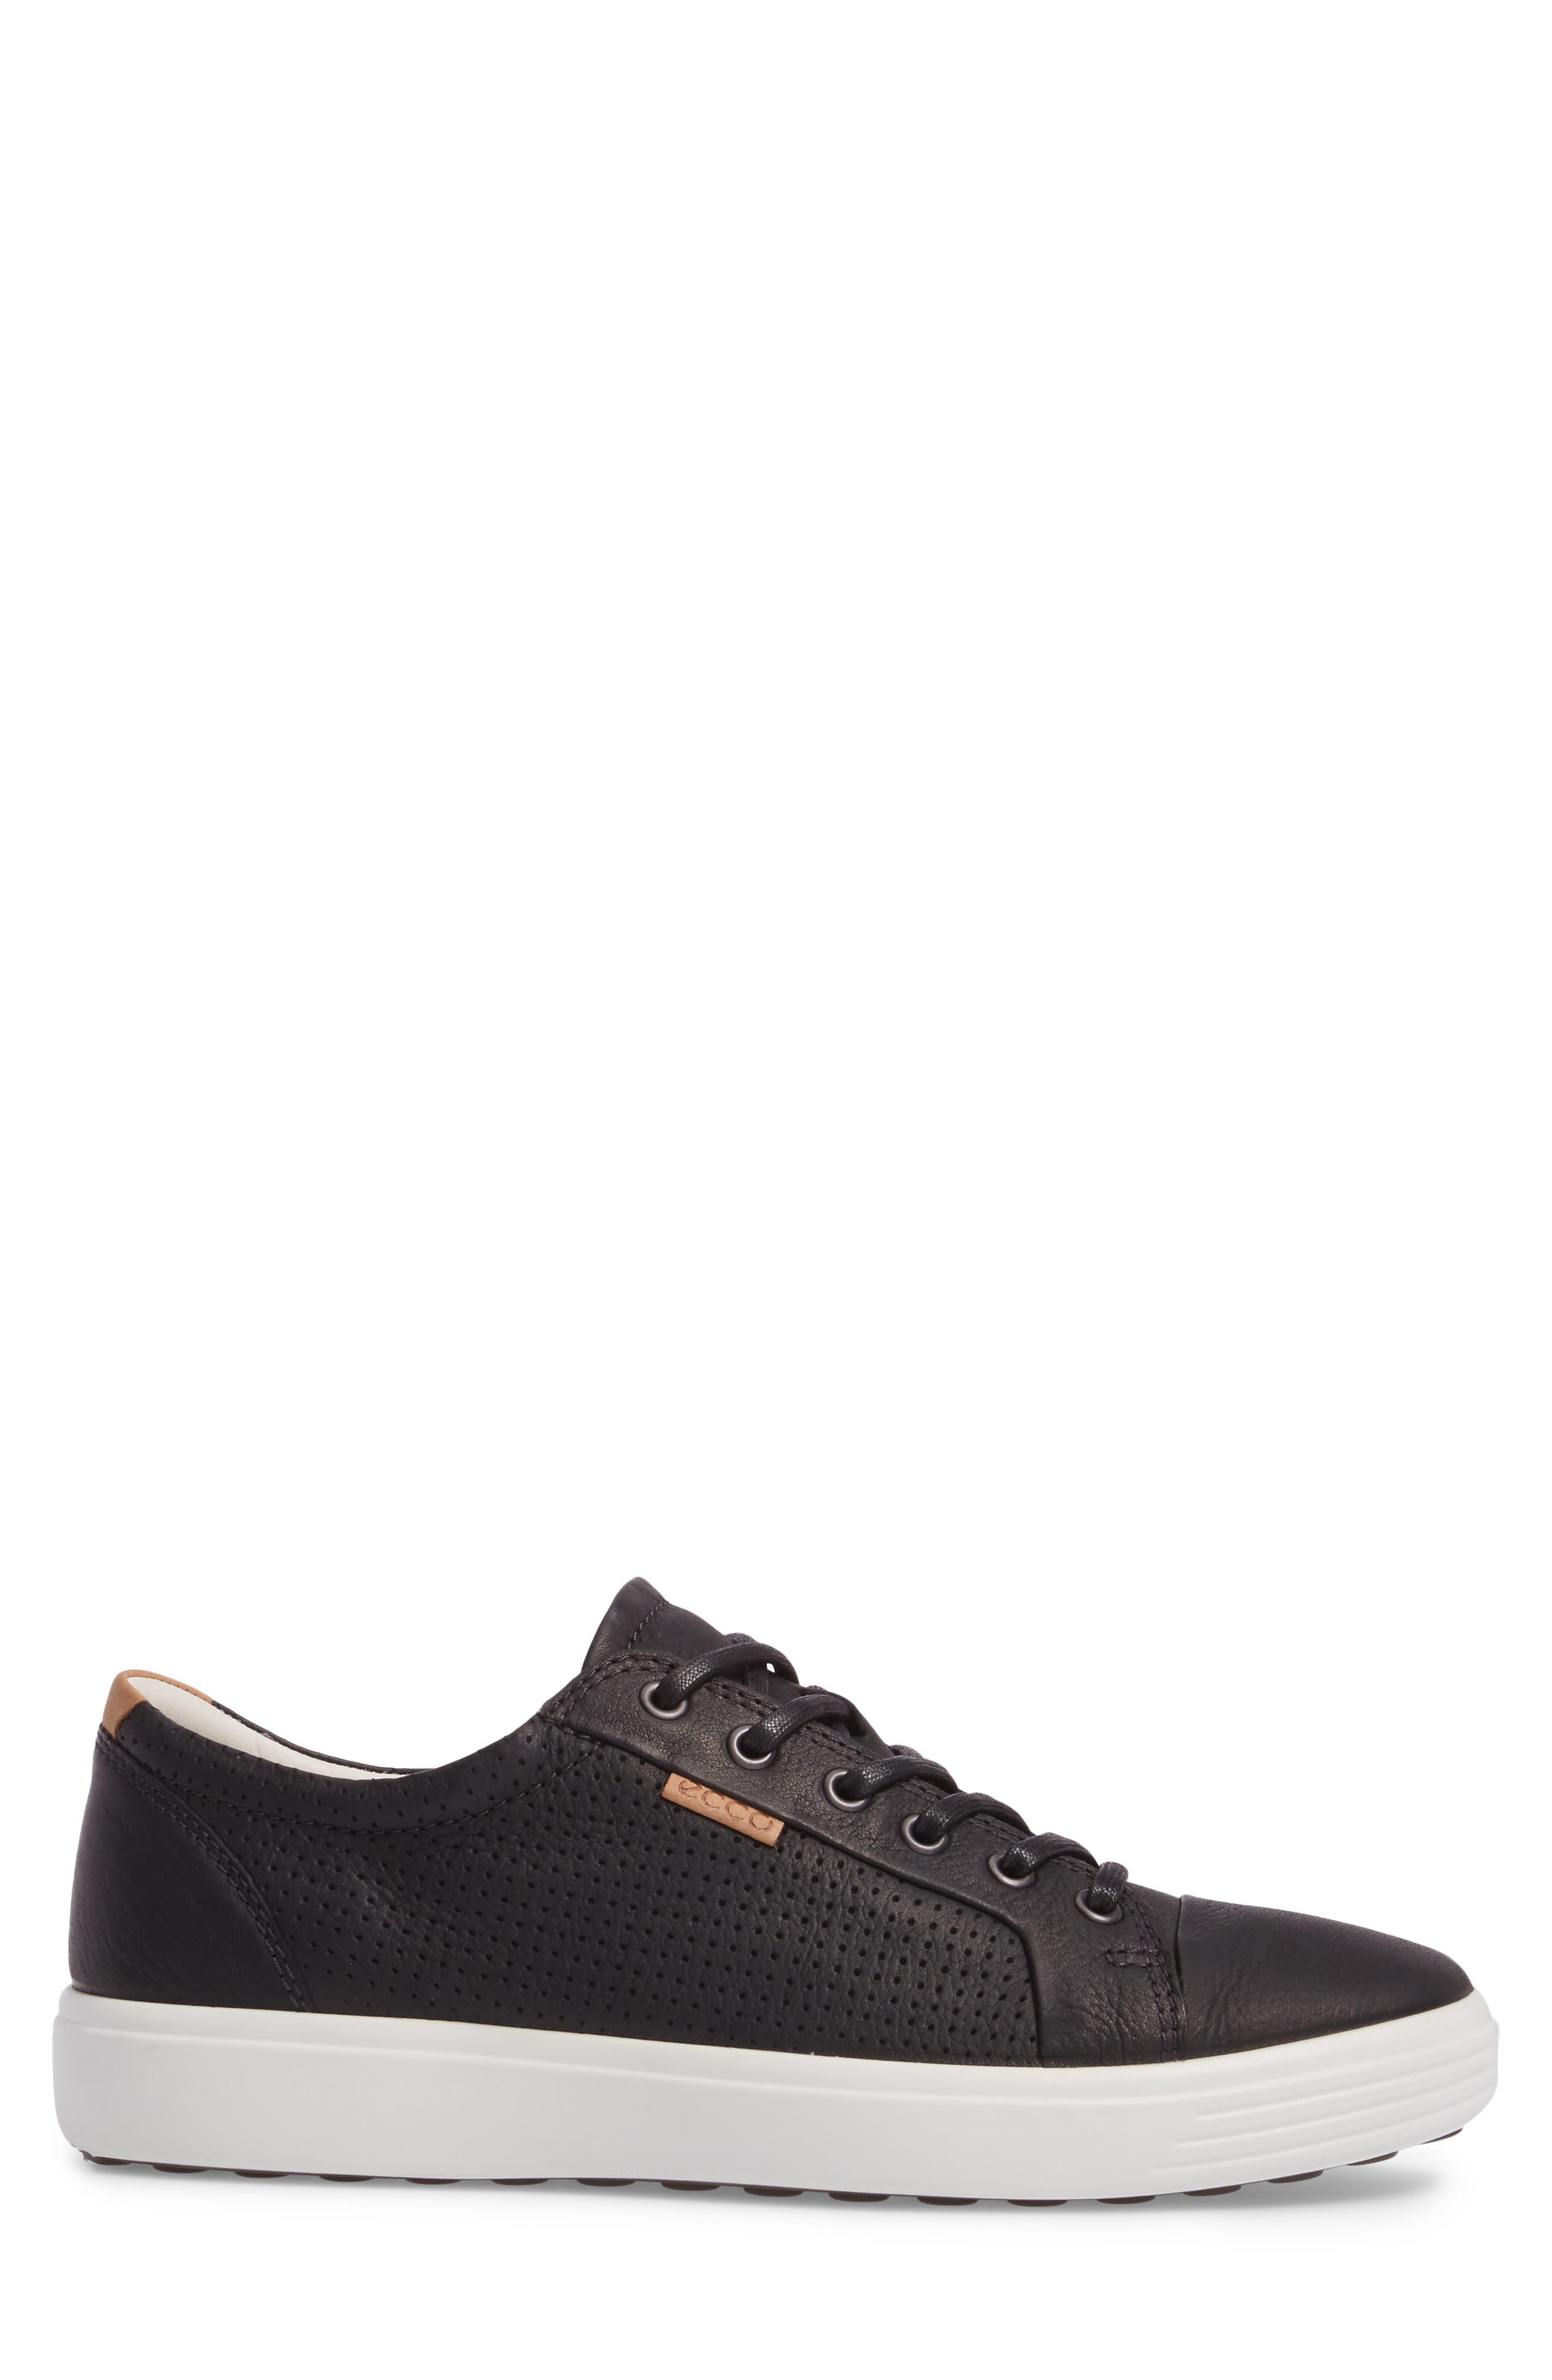 'Soft 7' Sneaker,                             Alternate thumbnail 3, color,                             BLACK LEATHER